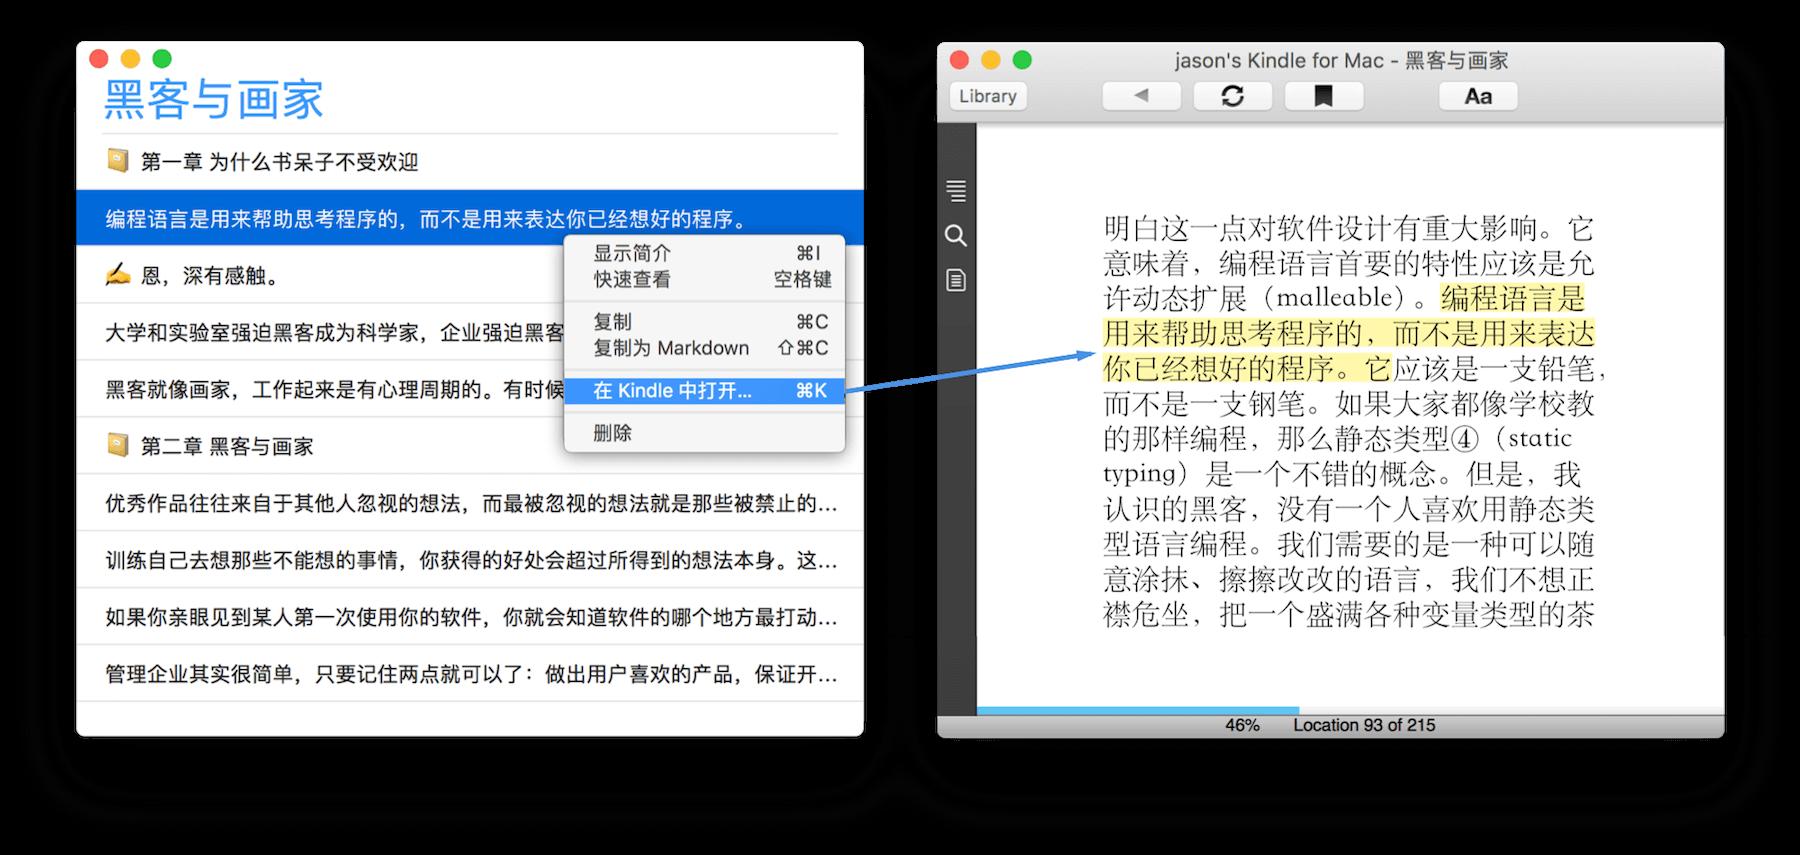 Klib 支持回顾、查看 Kindle 标注、笔记。可以打开 Kindle for macOS、并跳转至笔记对应的位置以查看 Kindle 标注、笔记的上下文。